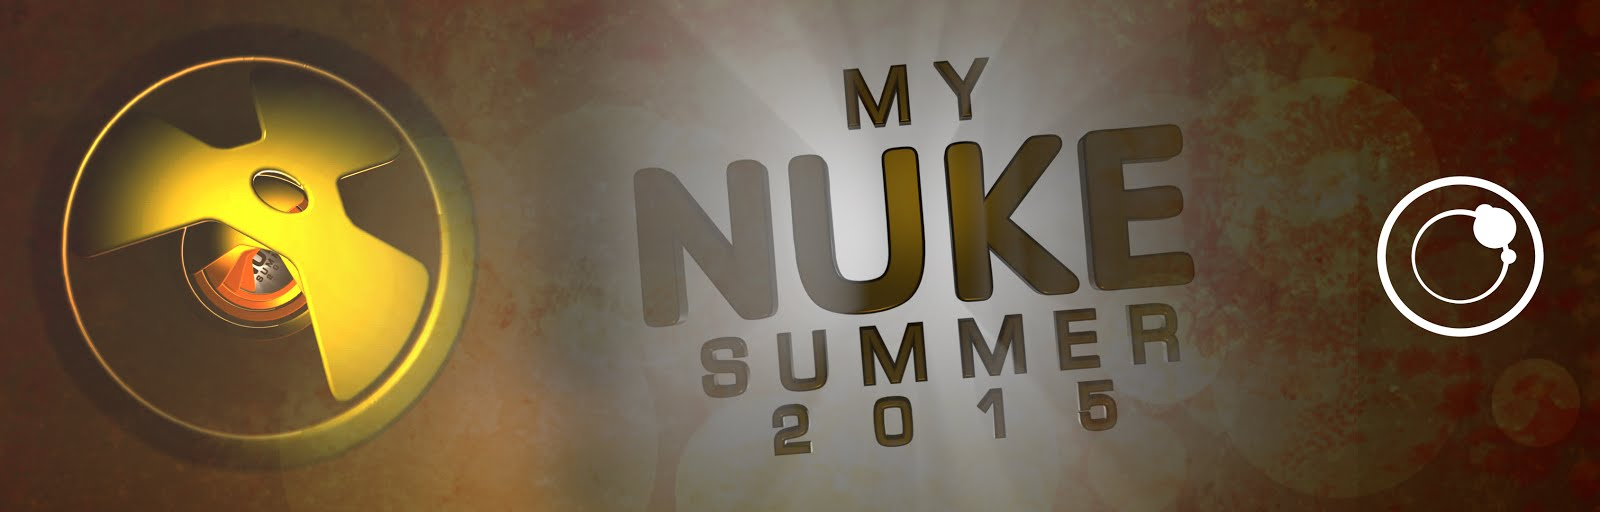 My NUKE Summer 2015